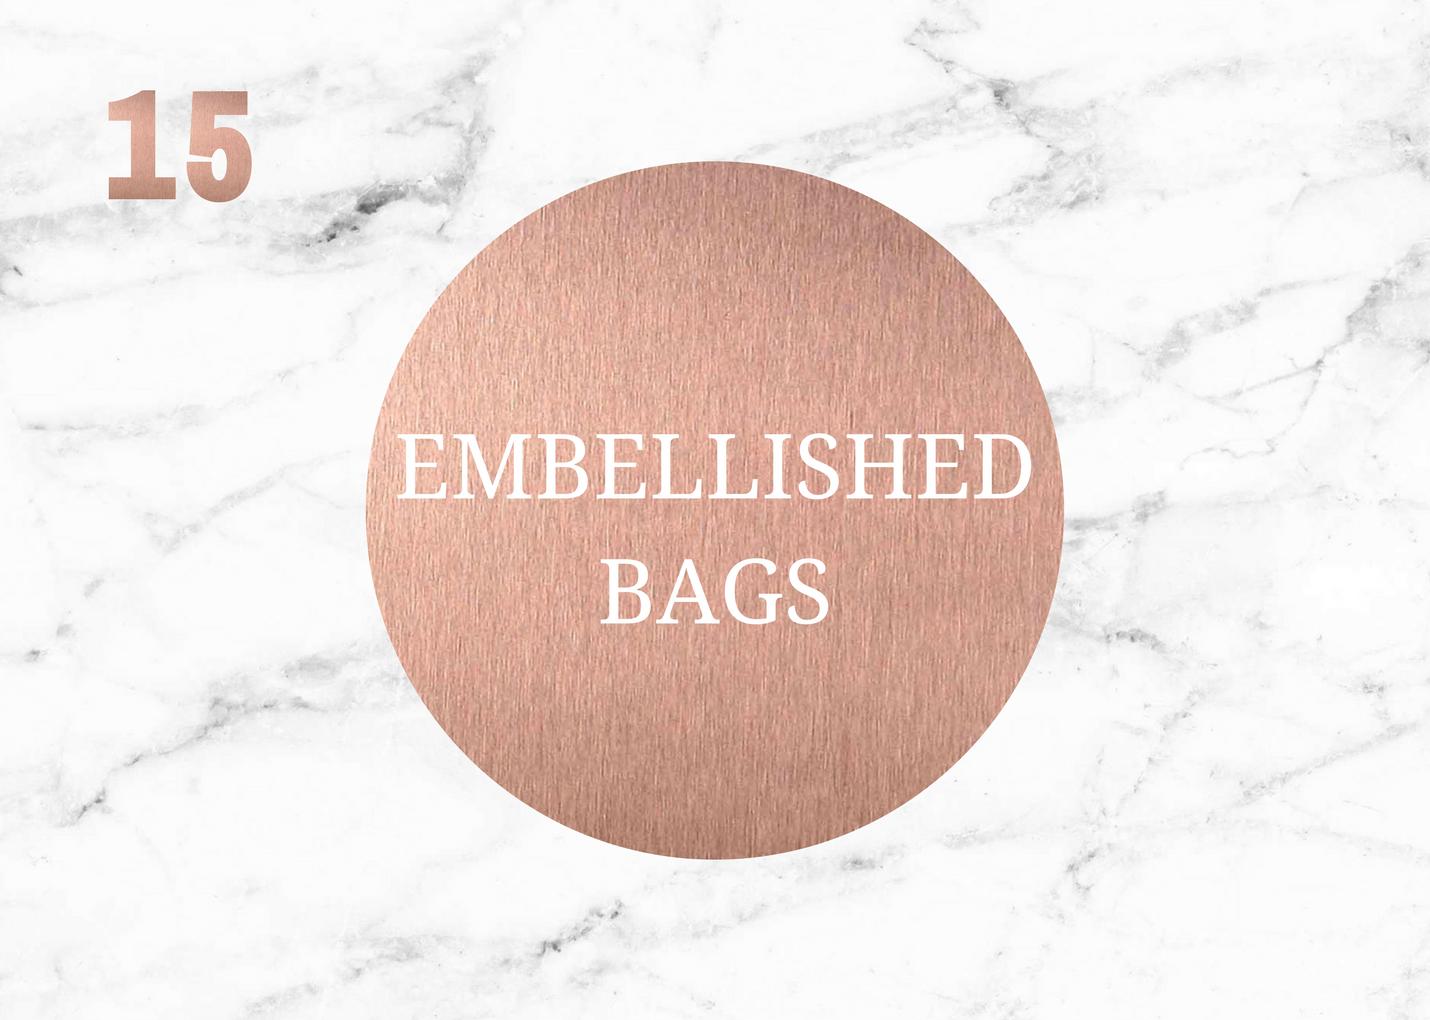 embellished bags.png